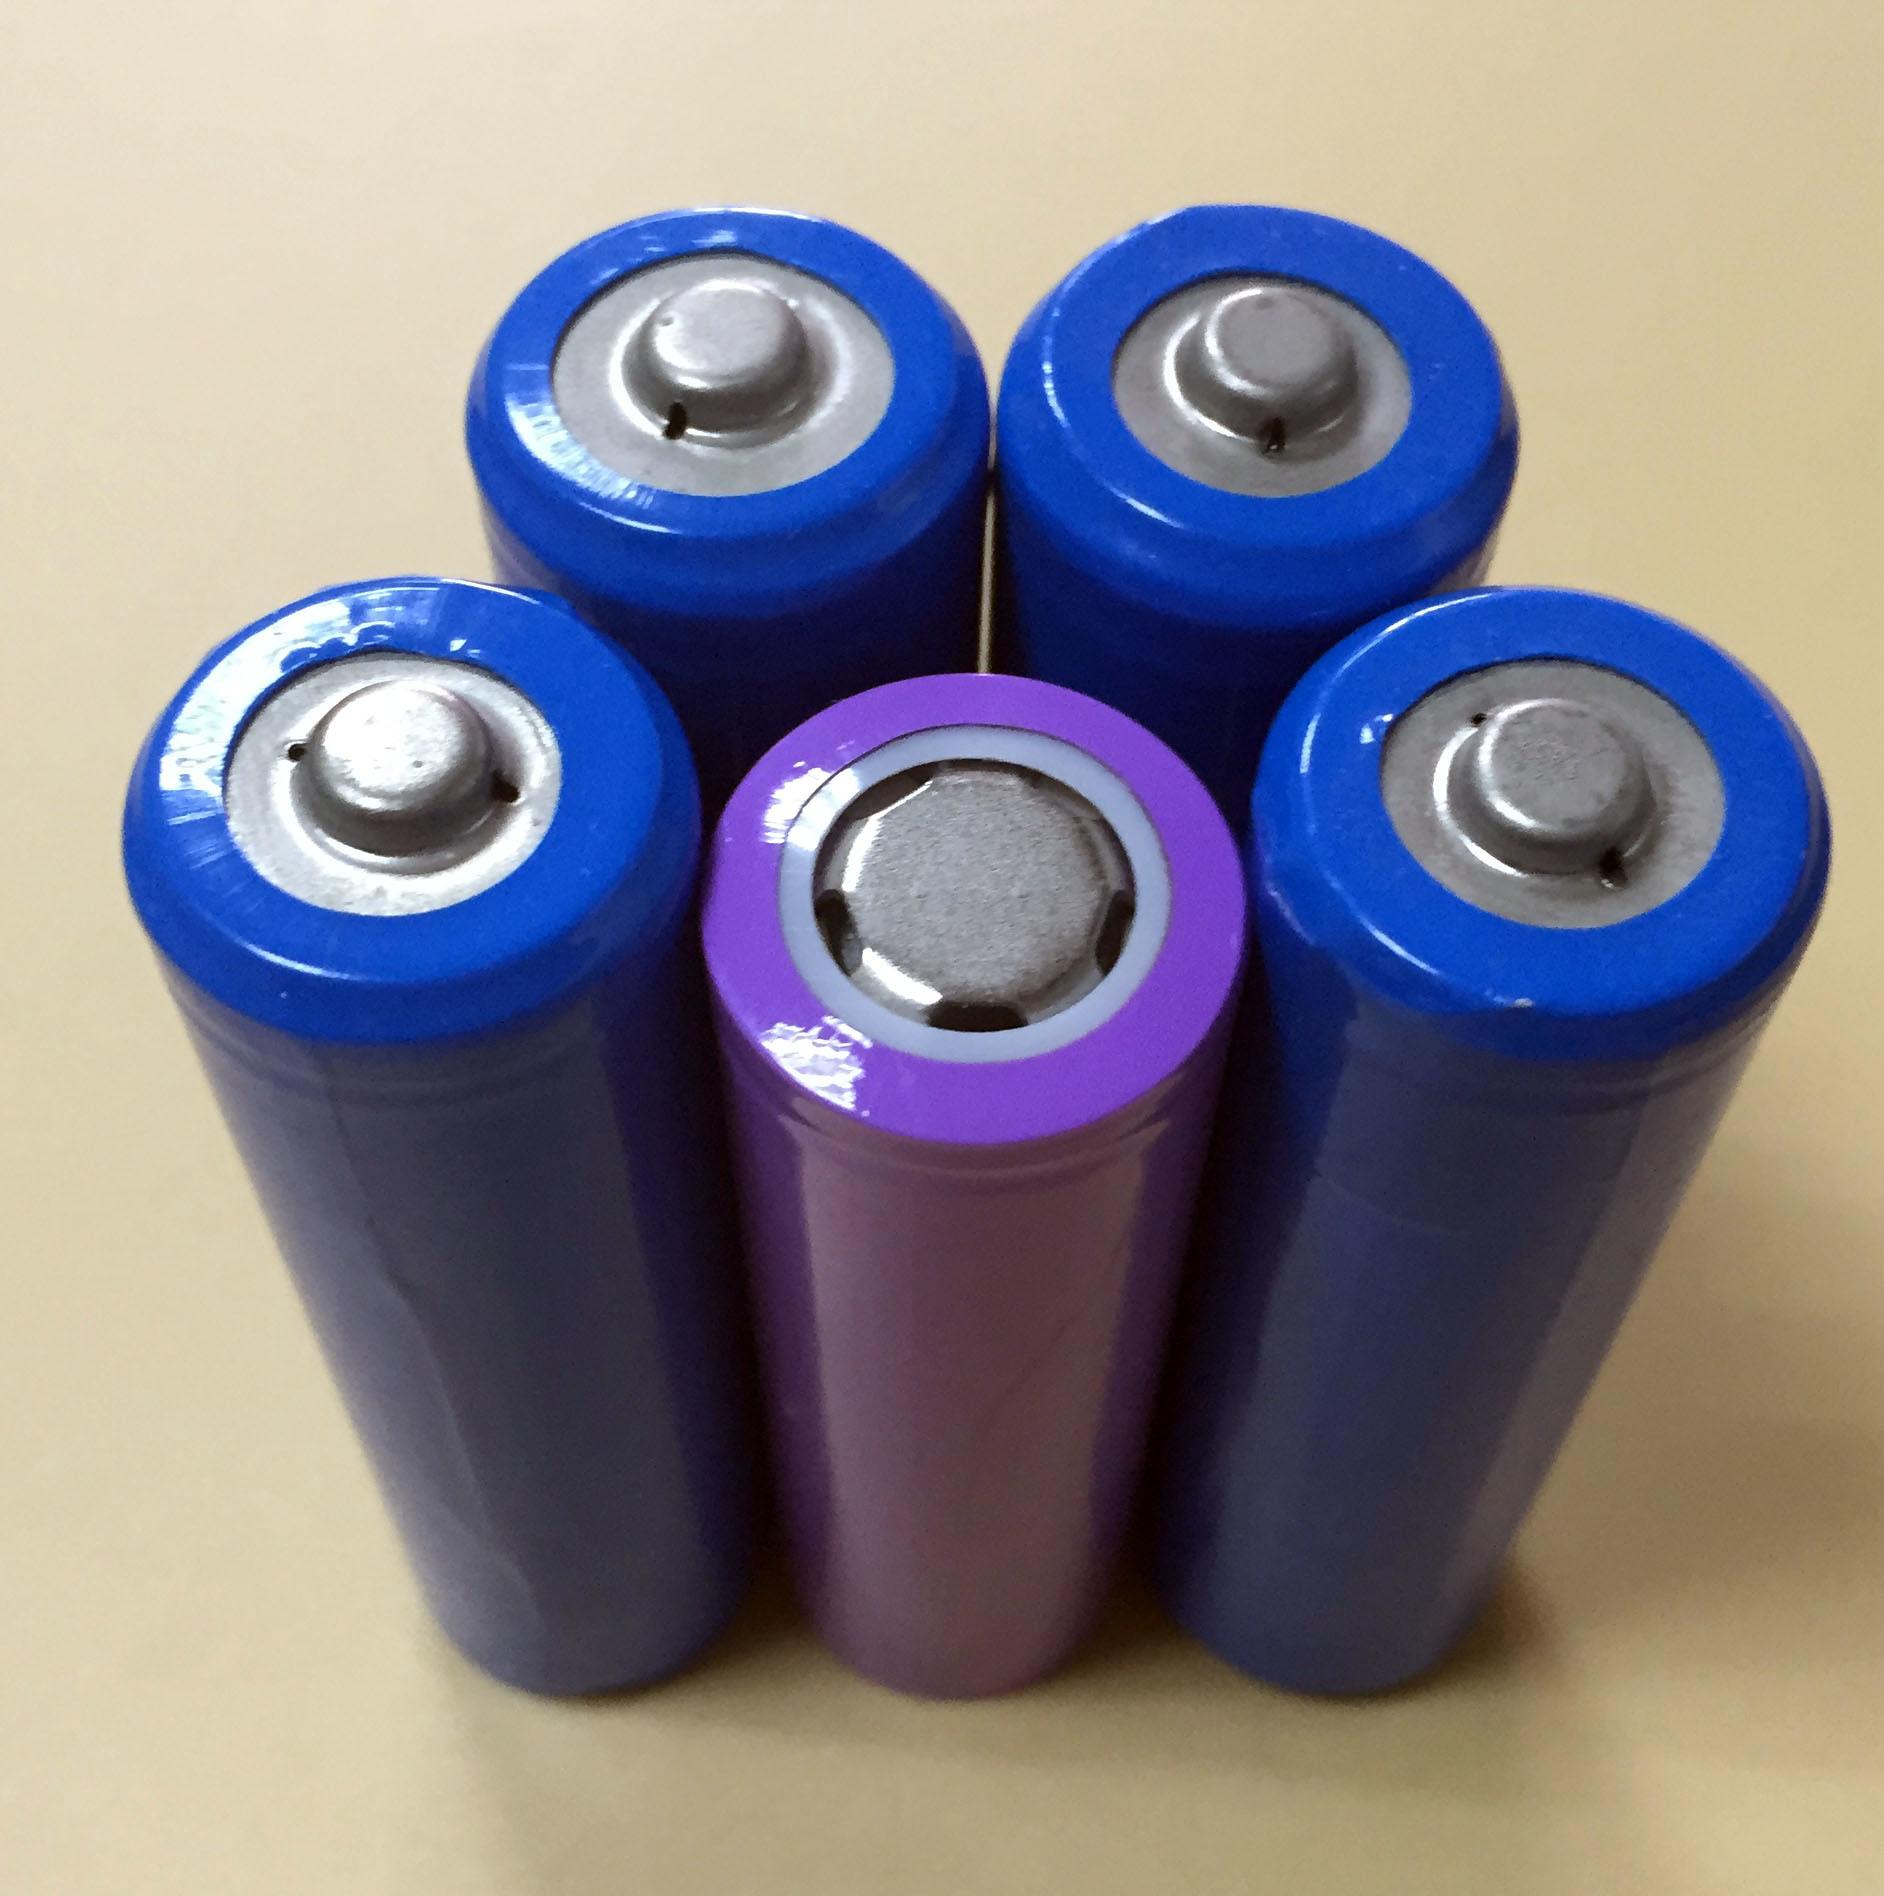 18650 3.7V 2600mAh 2200mAh Lithium Ion Battery